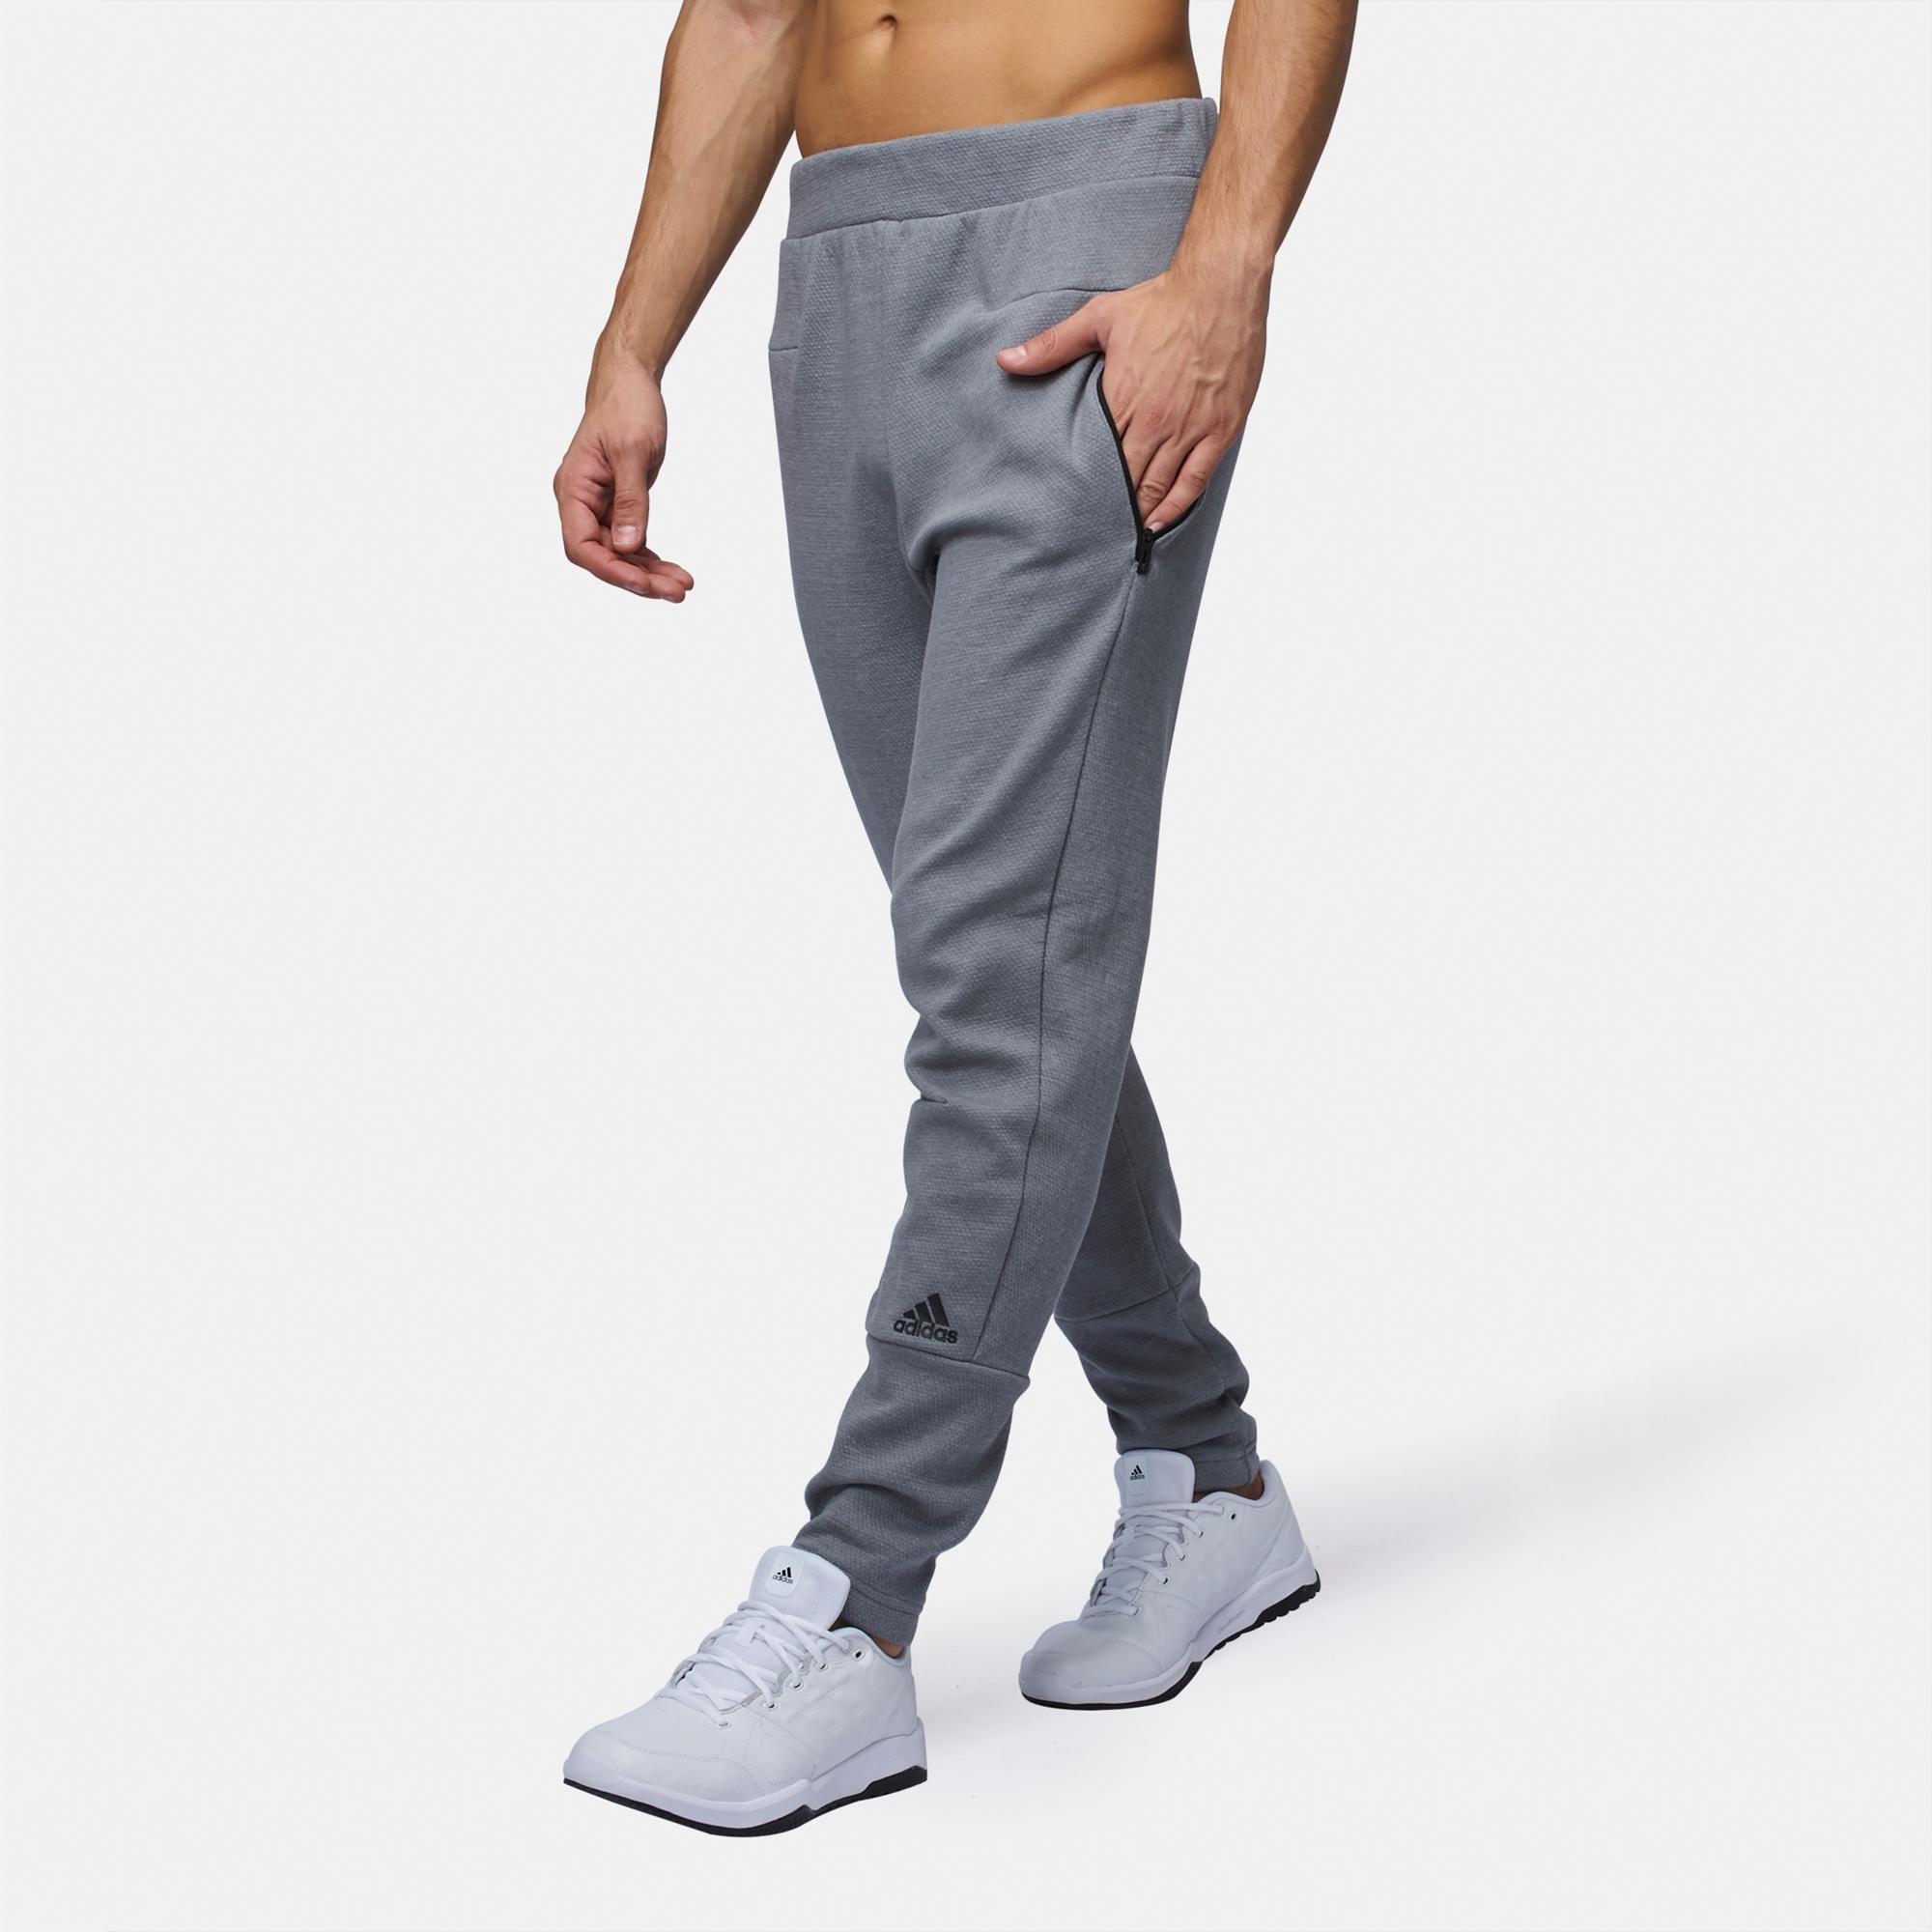 3fdb11250 Shop Grey adidas ID Champ Pants for Mens by adidas   SSS